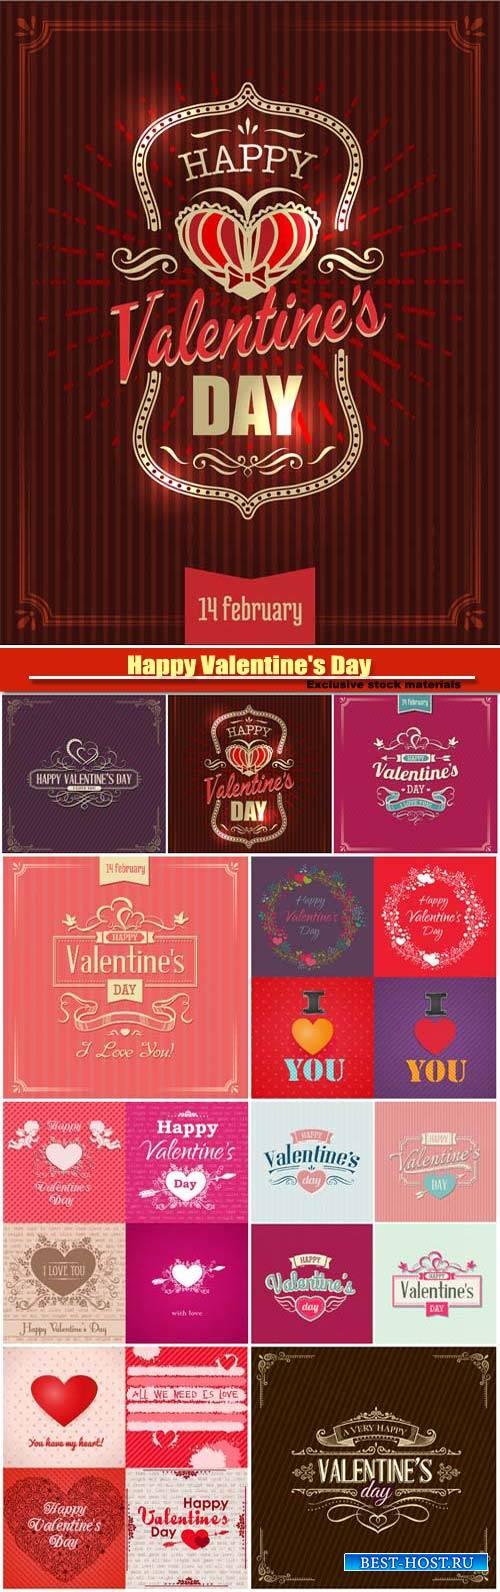 Happy Valentine's Day vector, hearts, romance, love #17